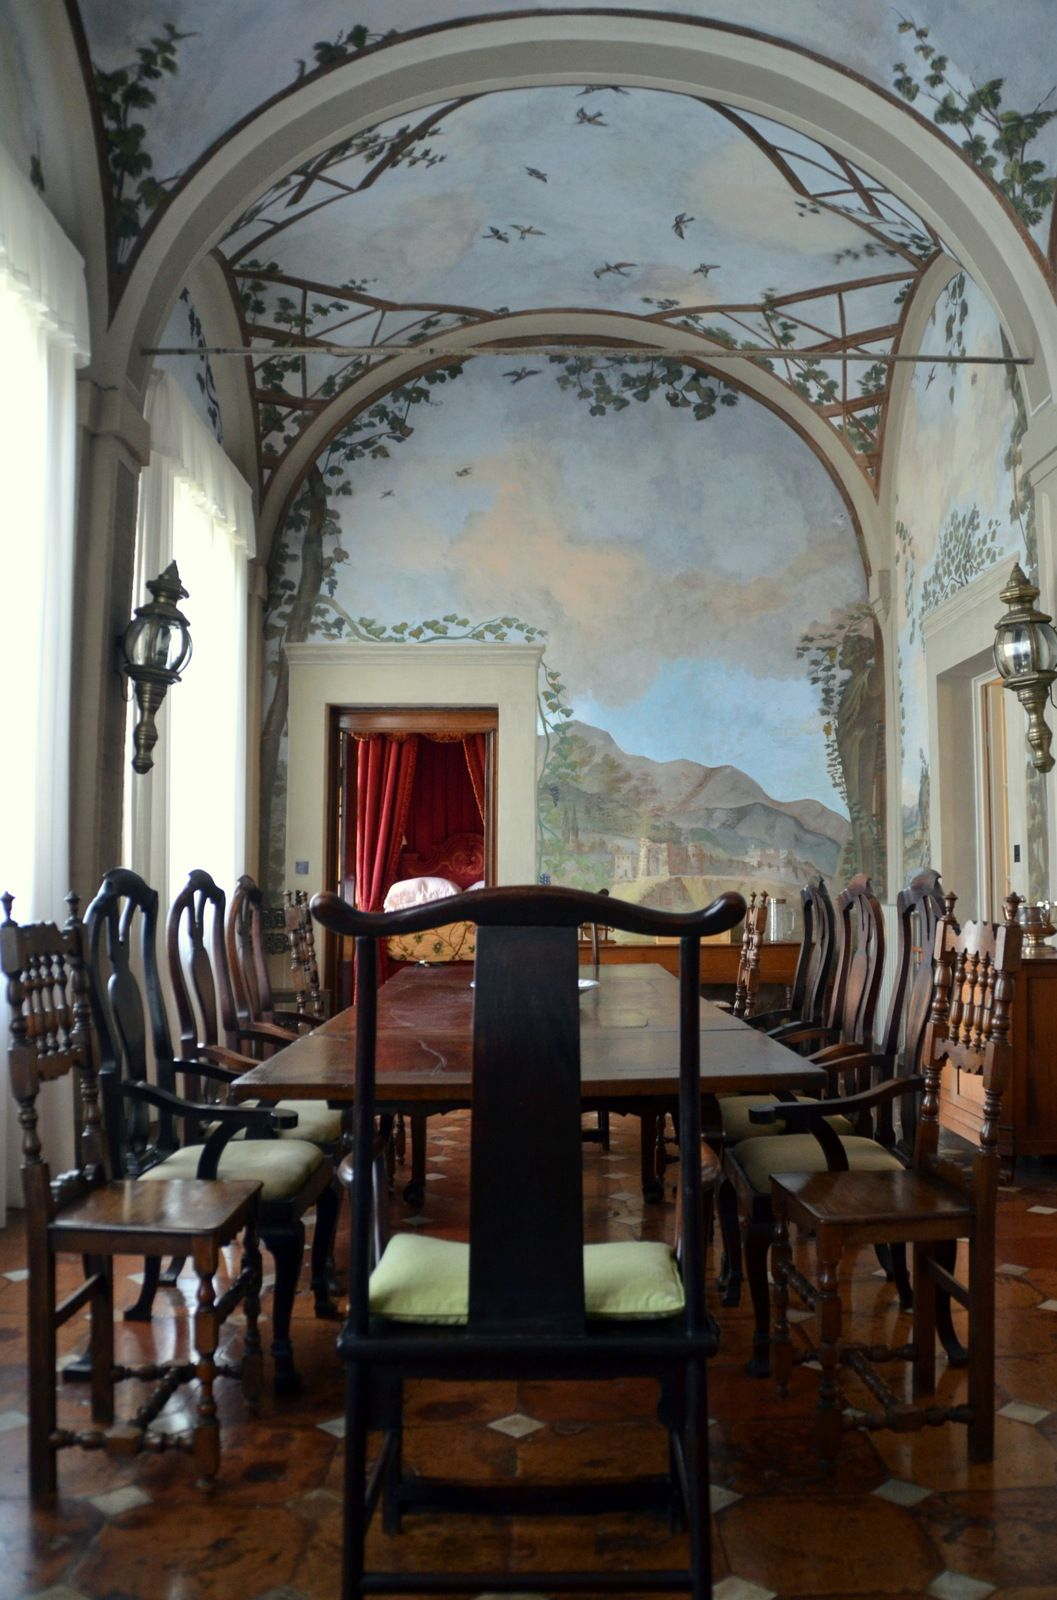 Wall Mural In Italian Dining Room